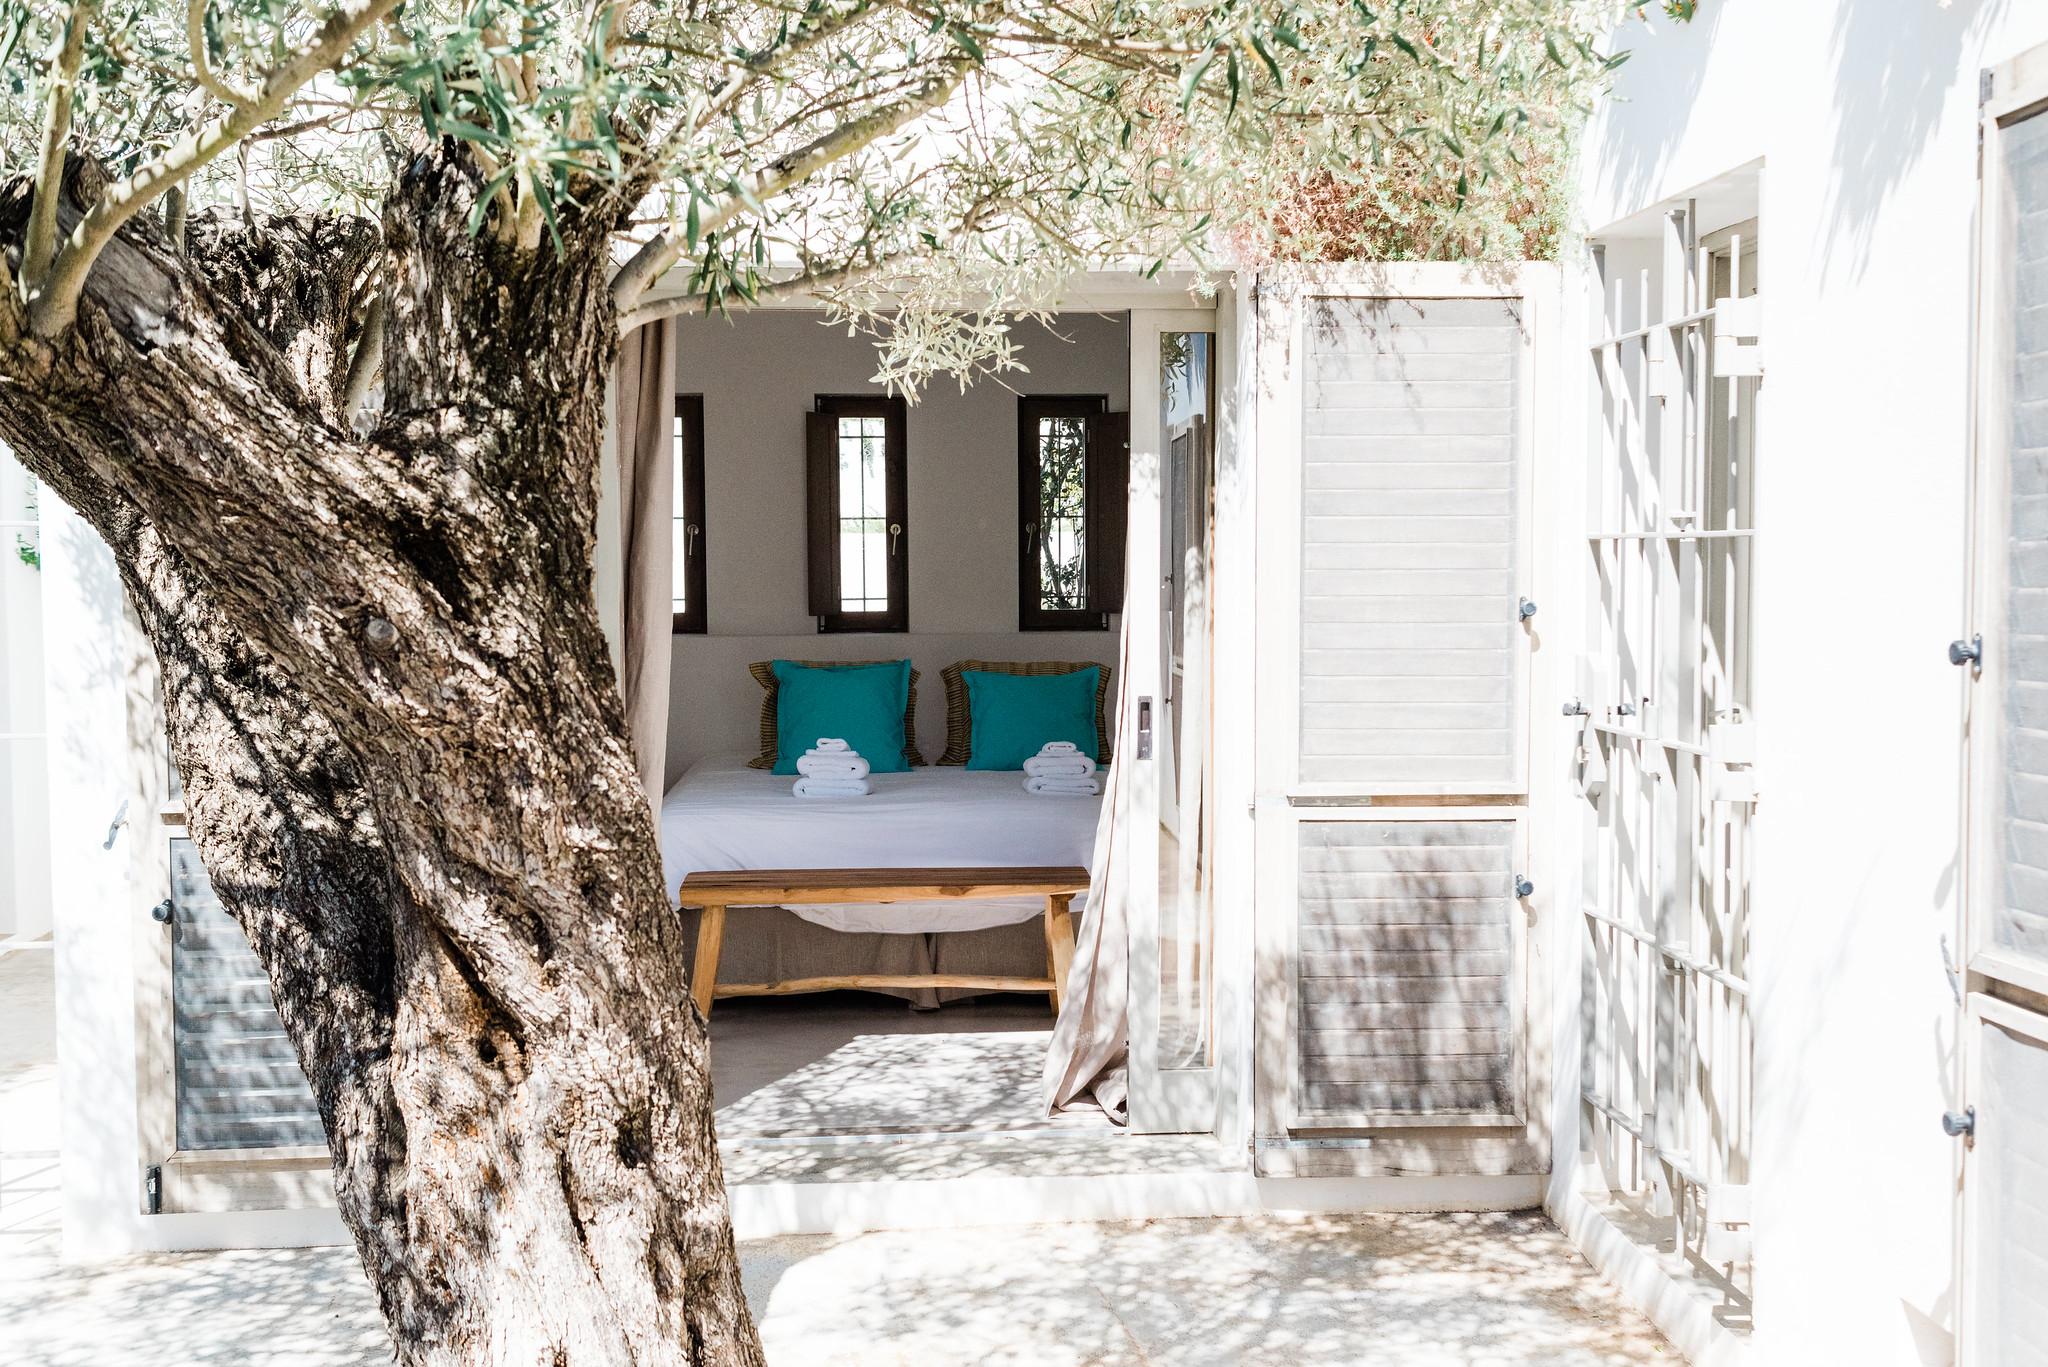 https://www.white-ibiza.com/wp-content/uploads/2020/06/white-ibiza-villas-casa-nyah-exterior-looking-in.jpg